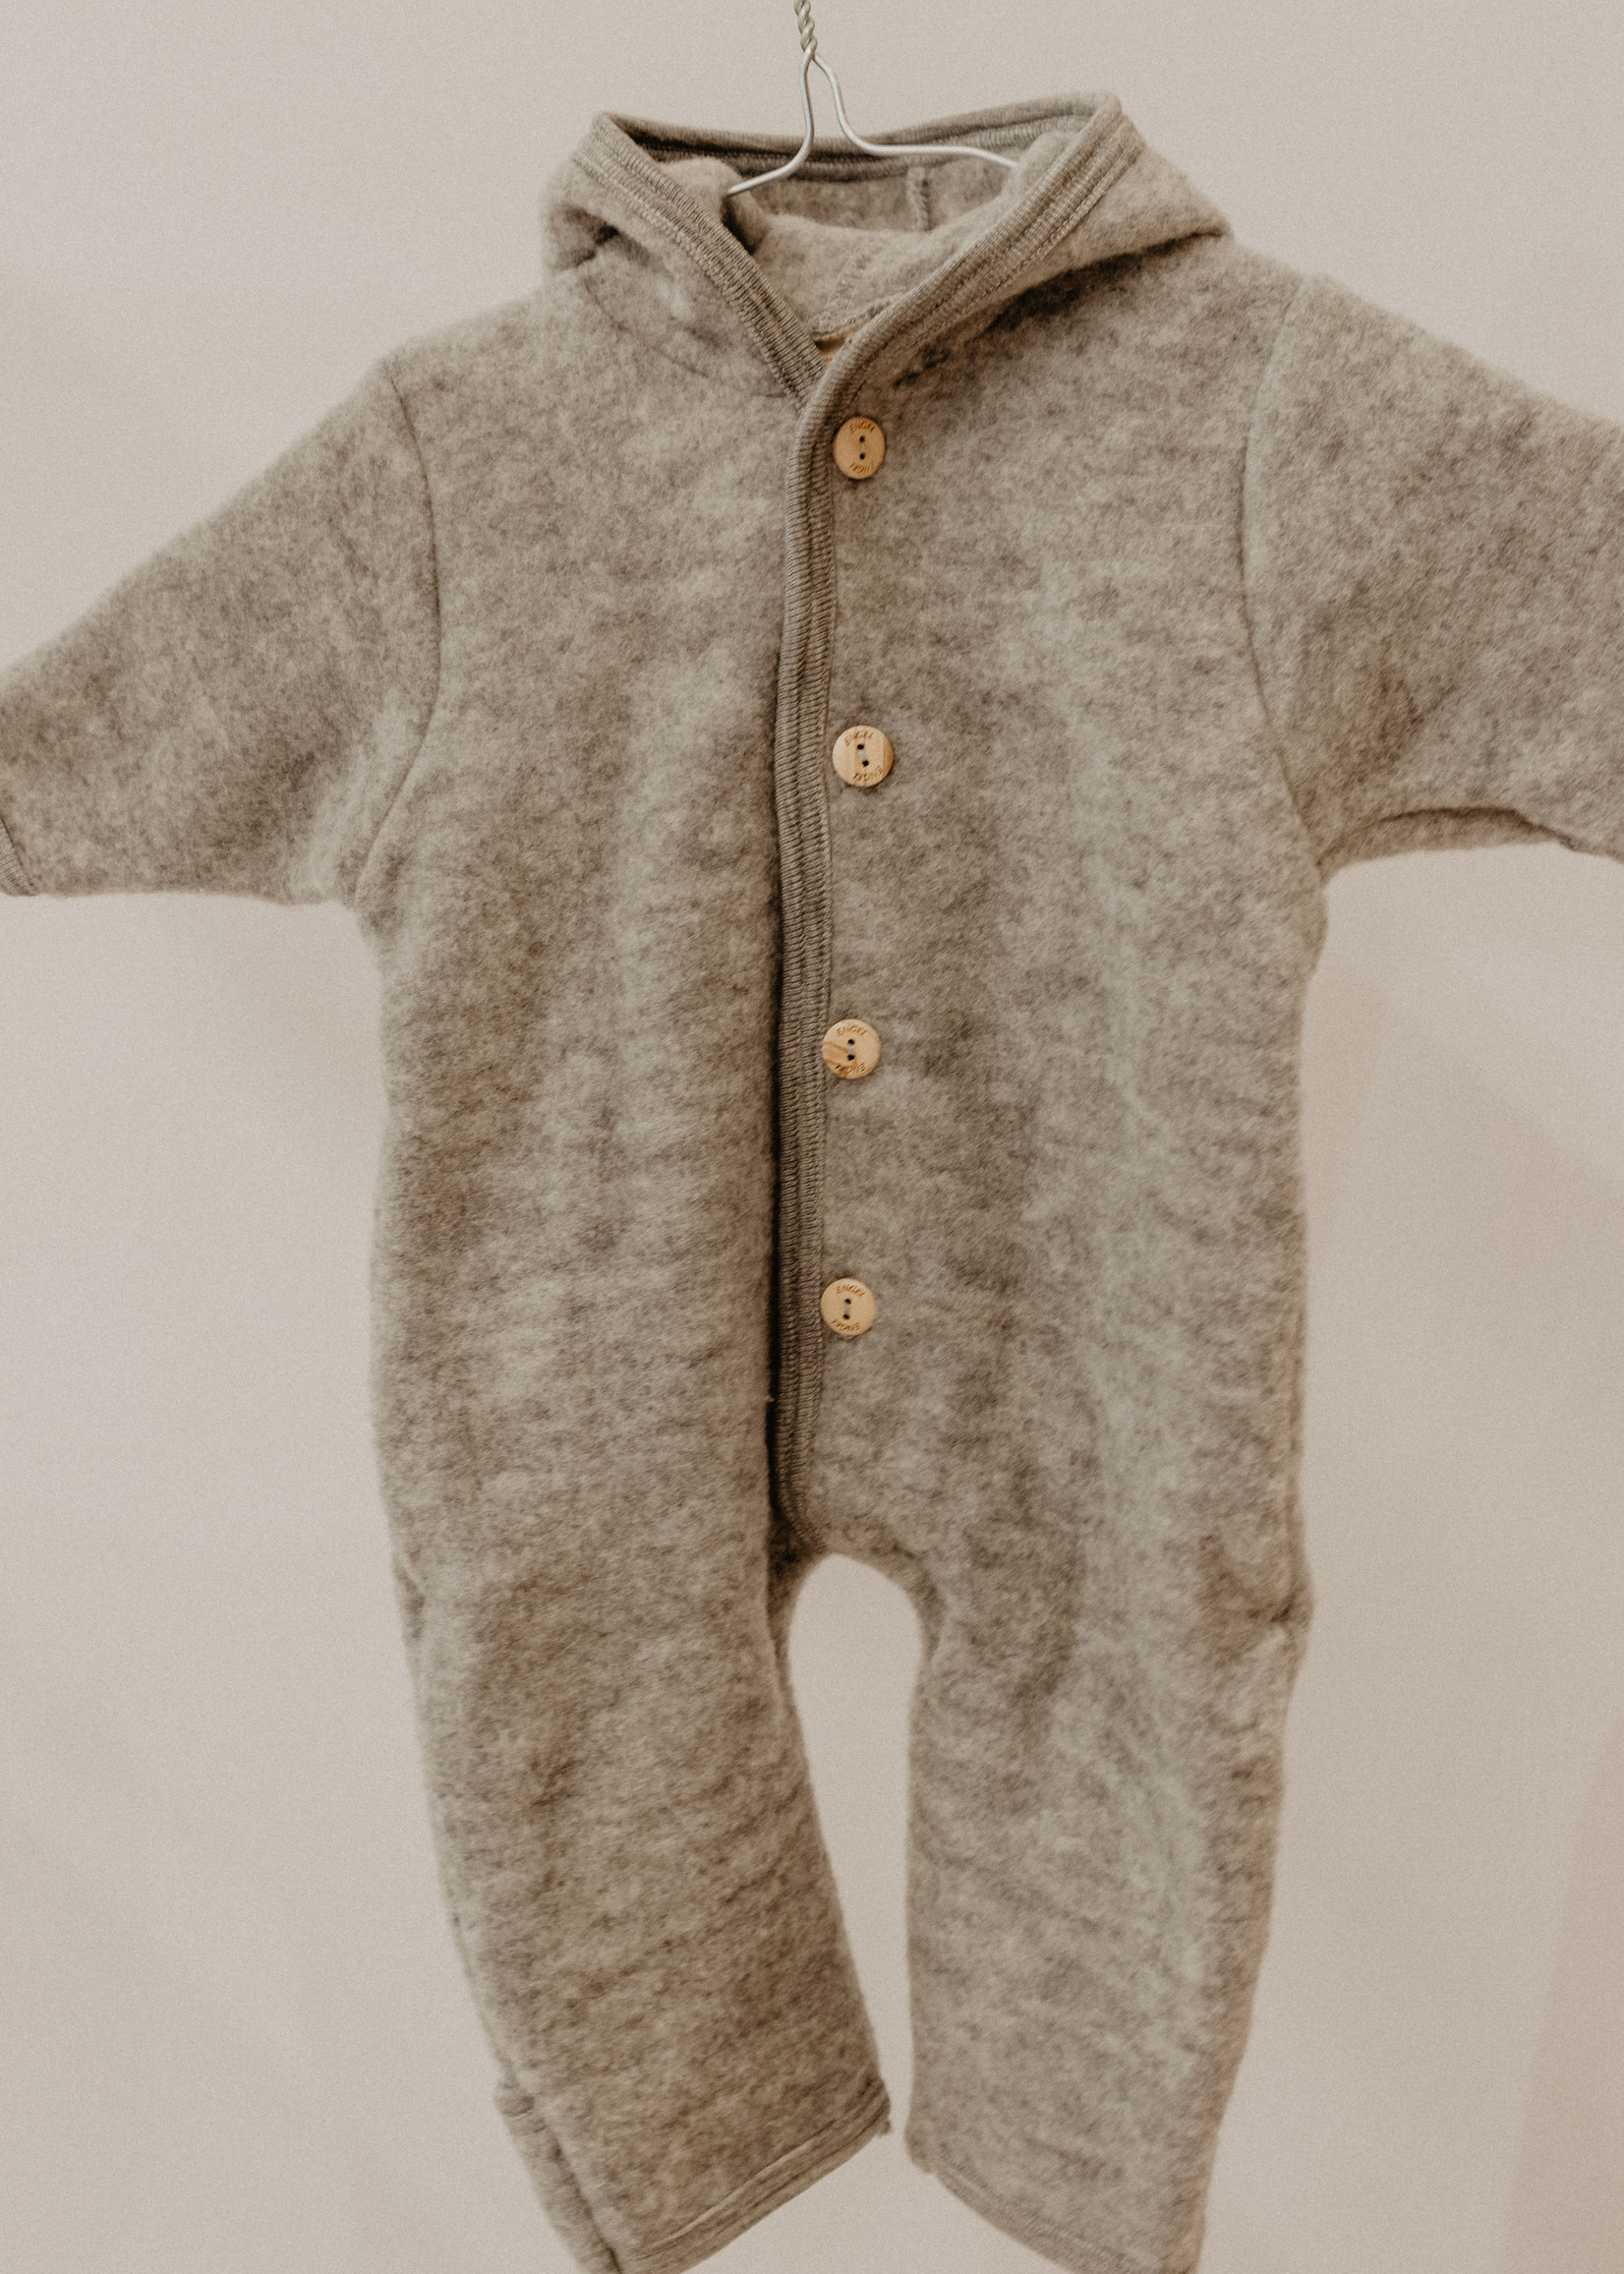 Engel Hooded Overall - Grey Melange